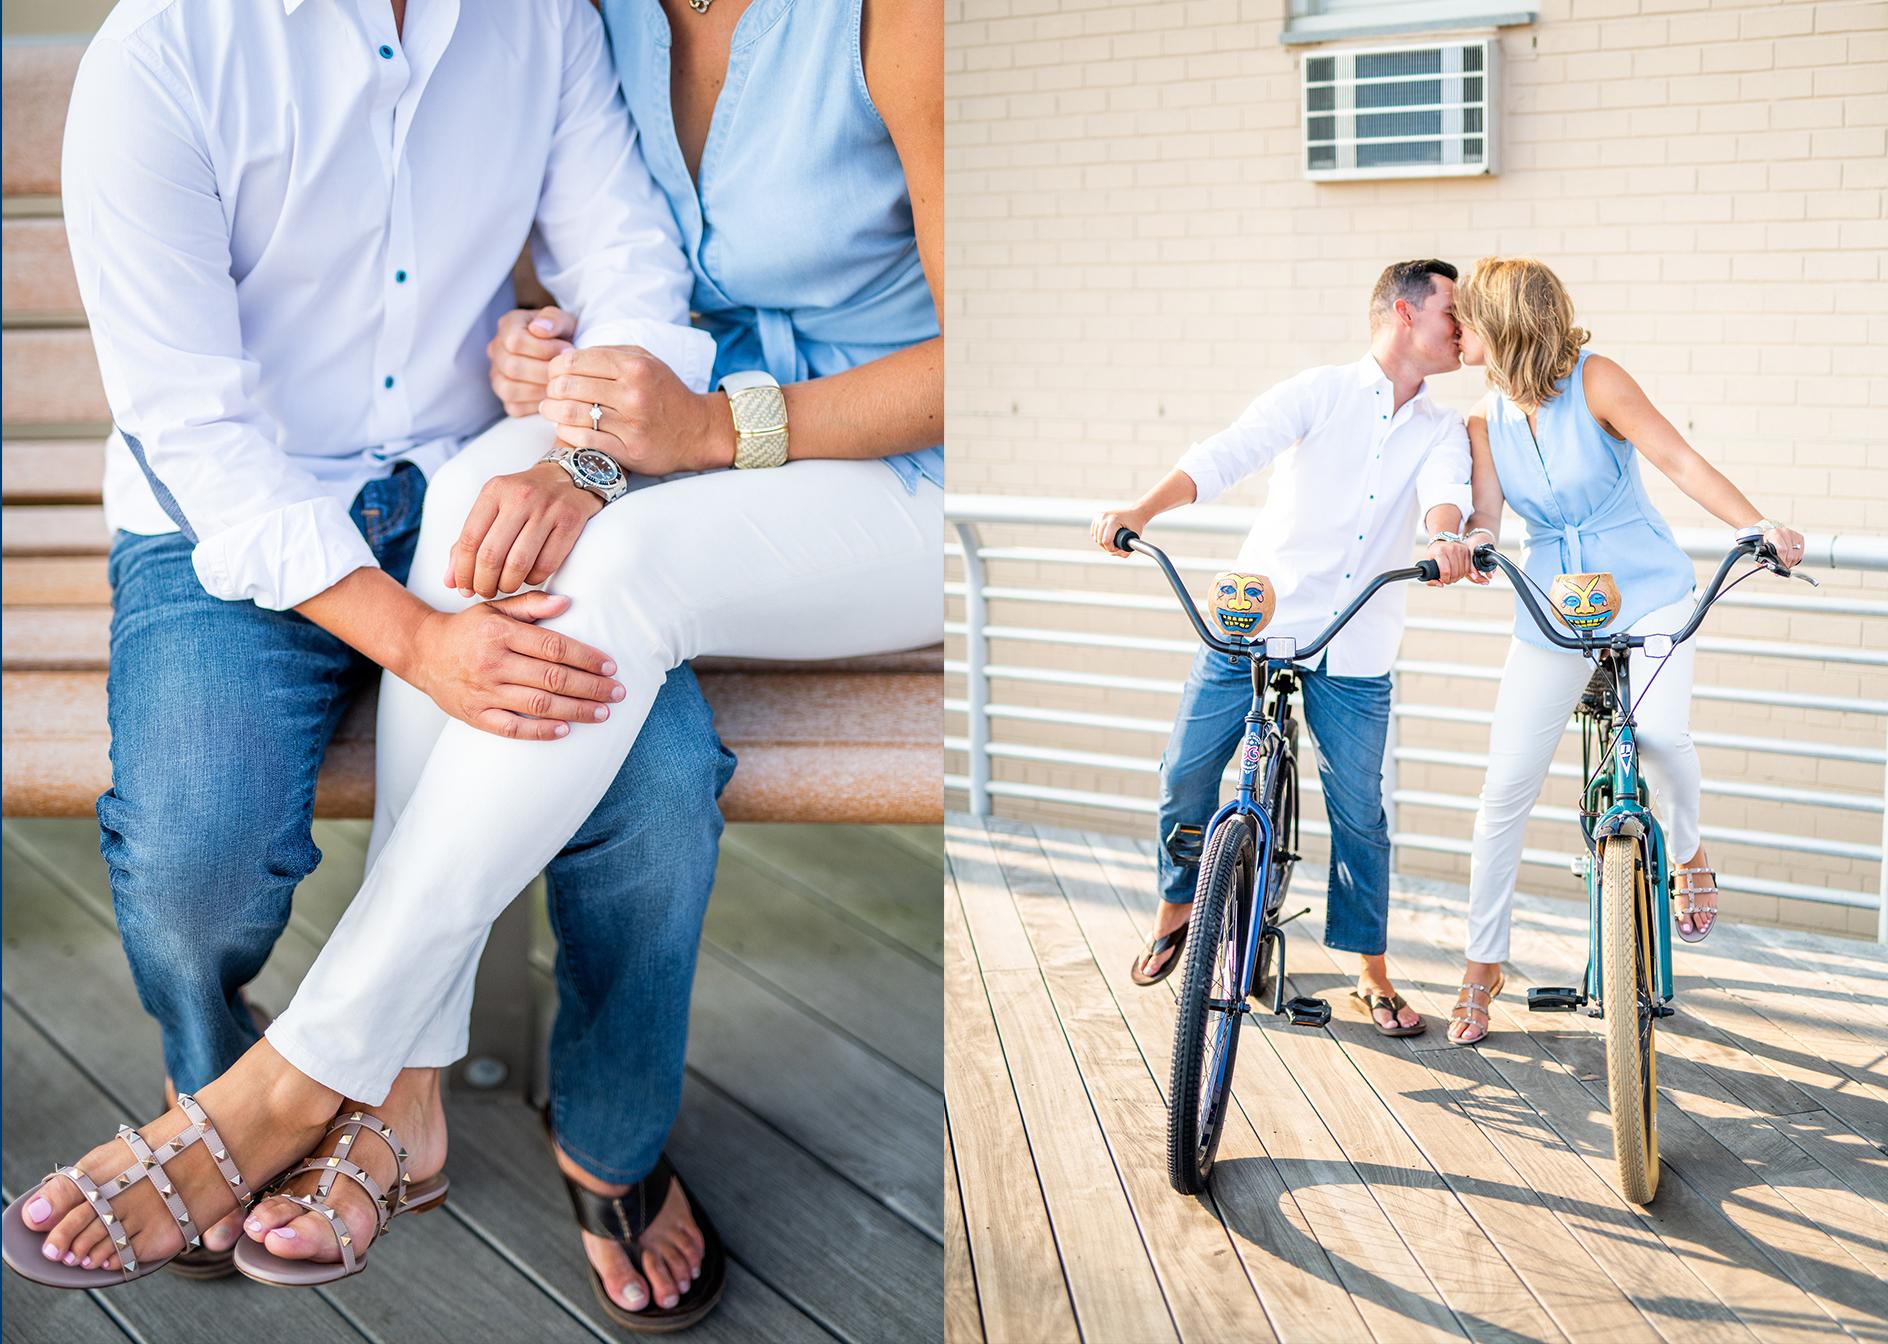 Long Beach NY Engagement Shoot | Long Beach Boardwalk Engagement Shoot | Long Island Wedding Photographer 23